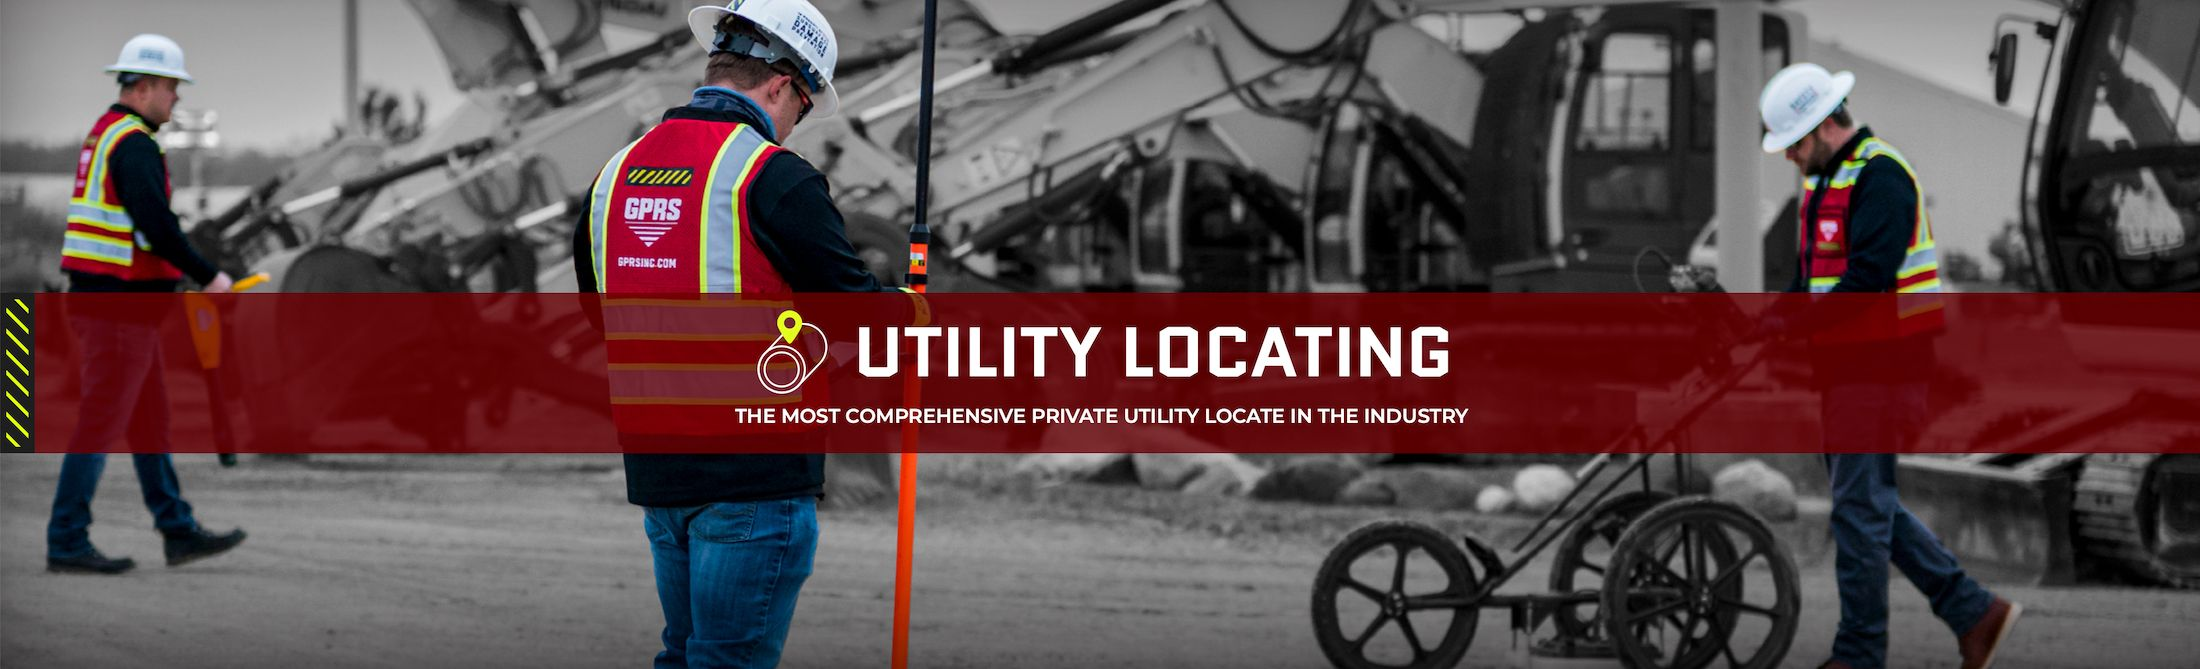 utility-locating.jpg